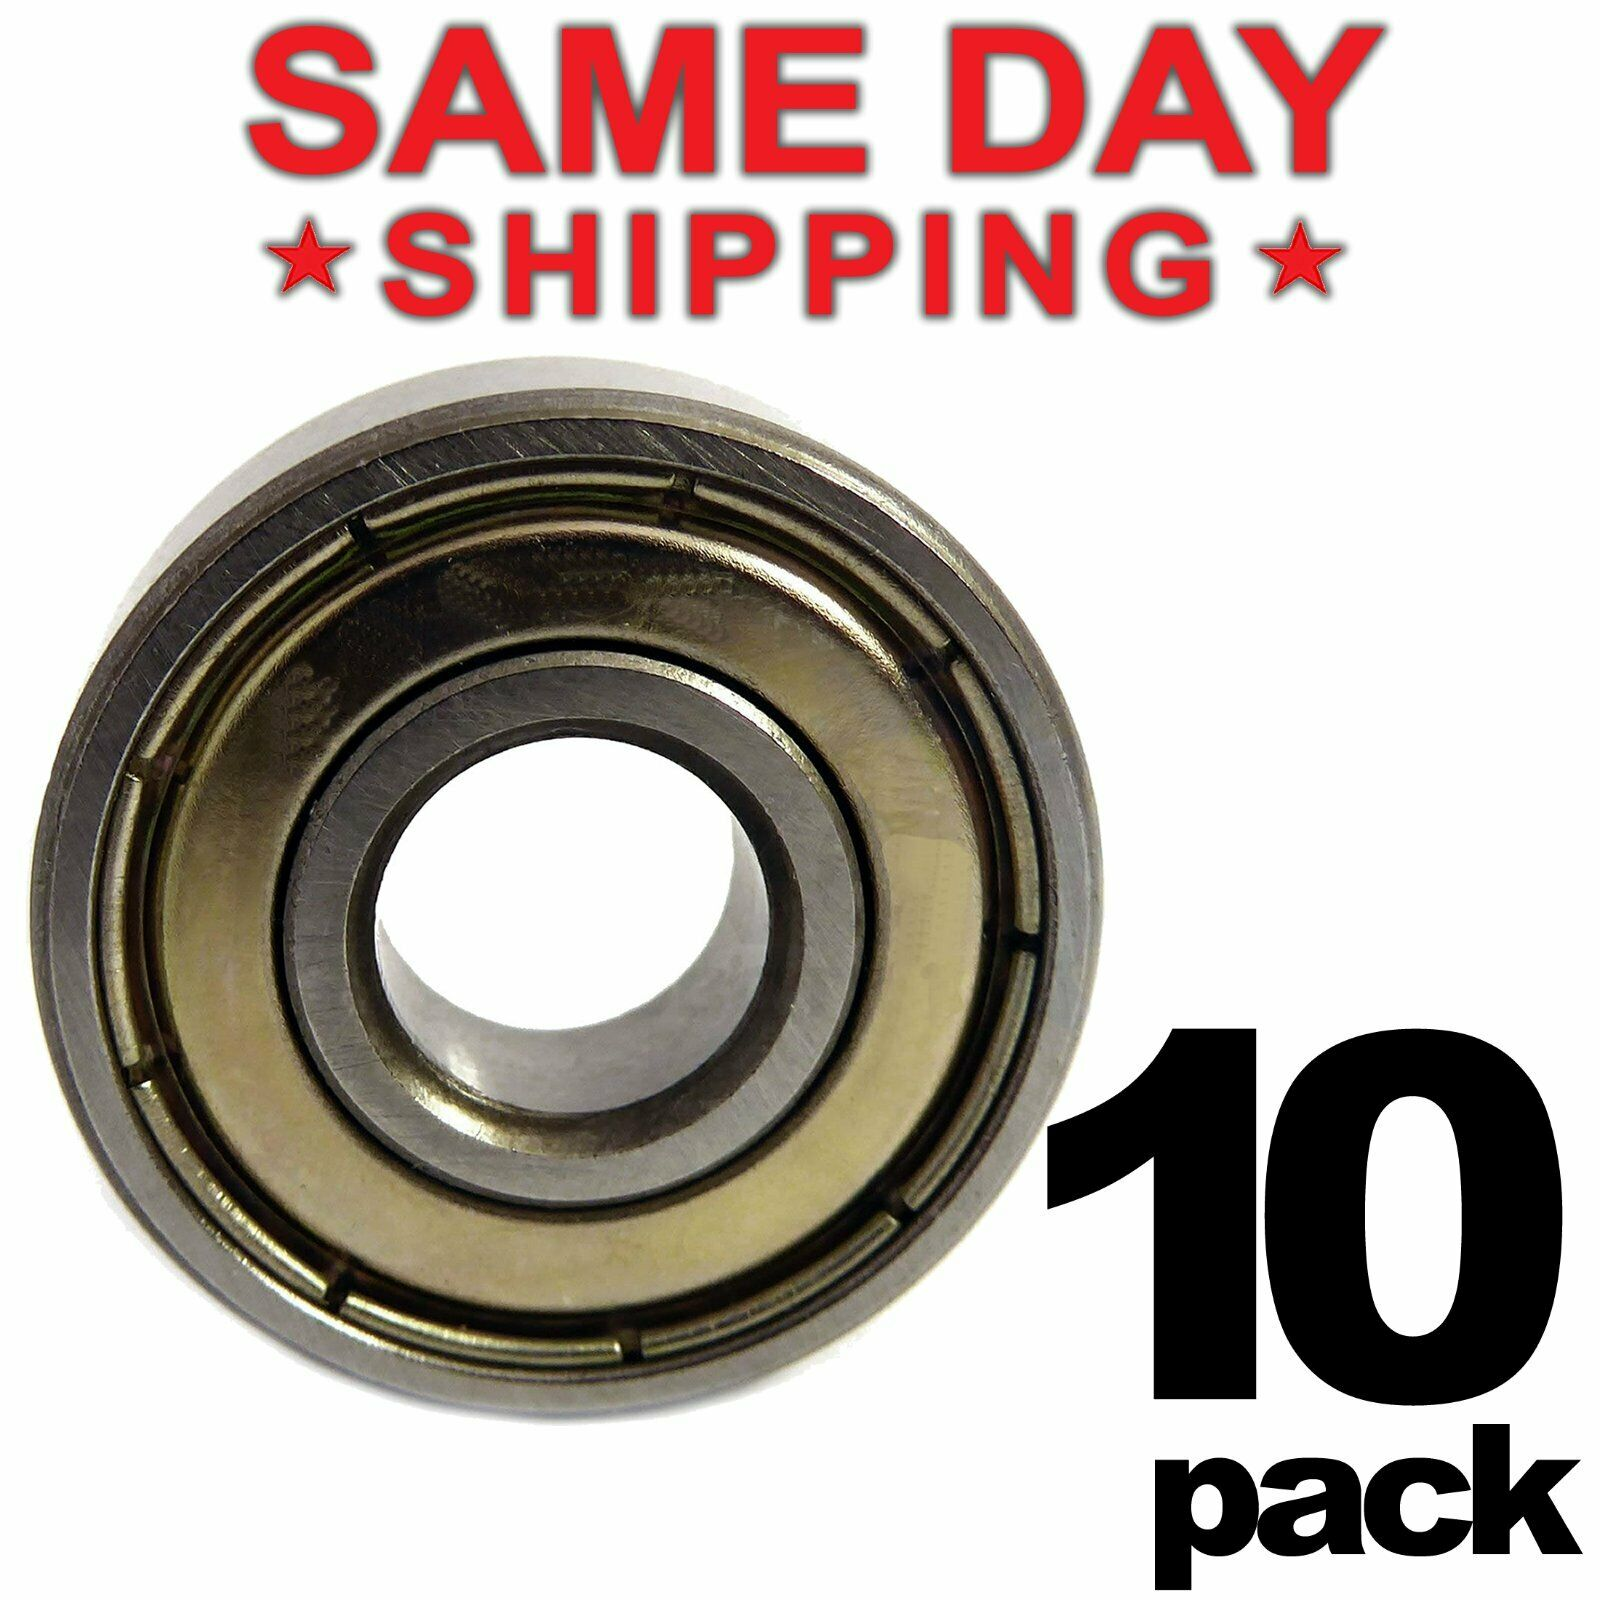 Qty.100 625-ZZ metal shields 625Z bearing 625 2Z ball bearings 625 ZZ